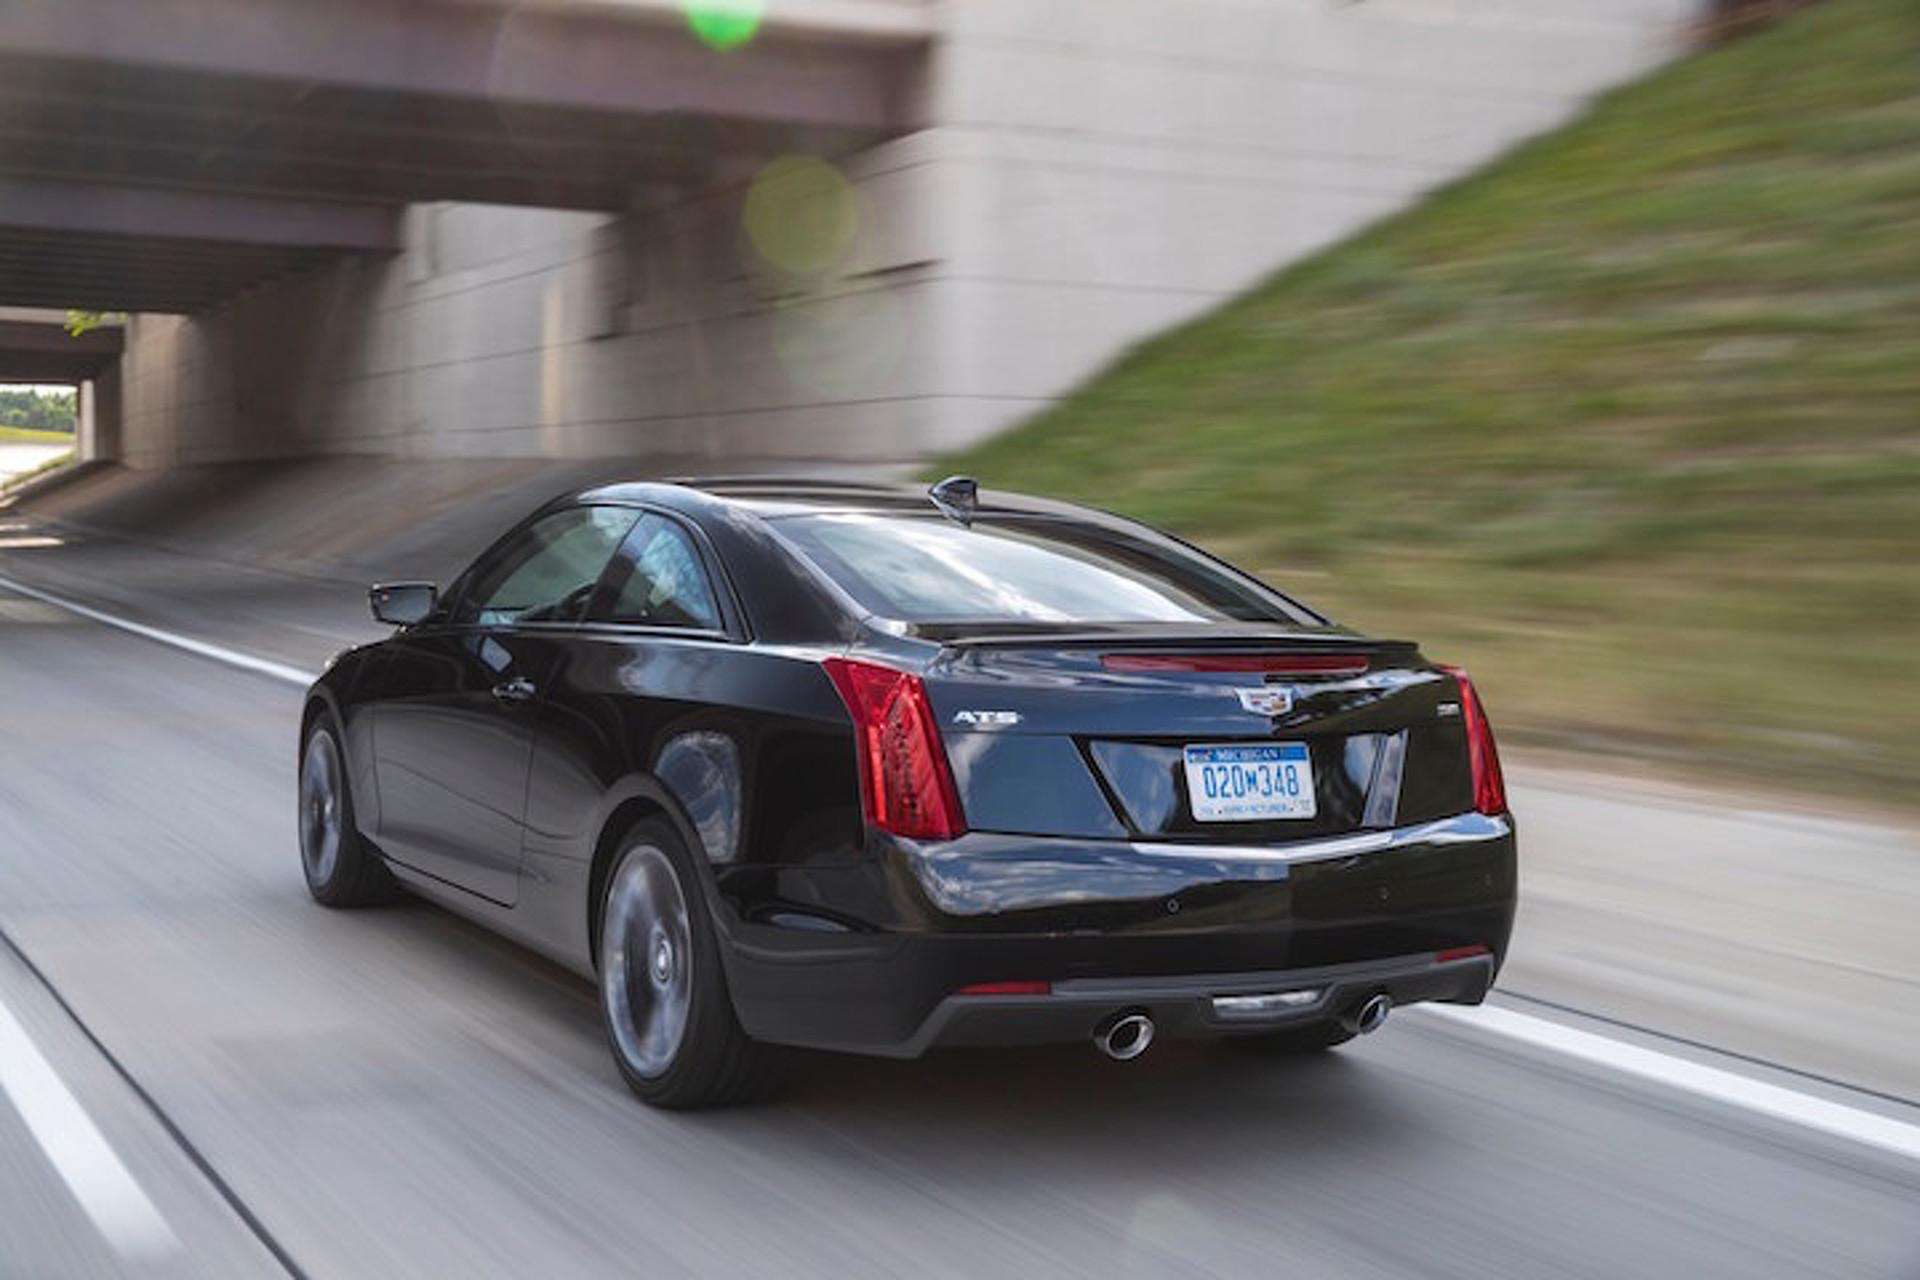 2017 Cadillac ATS 'Carbon Black' Aims to Impress Enthusiasts